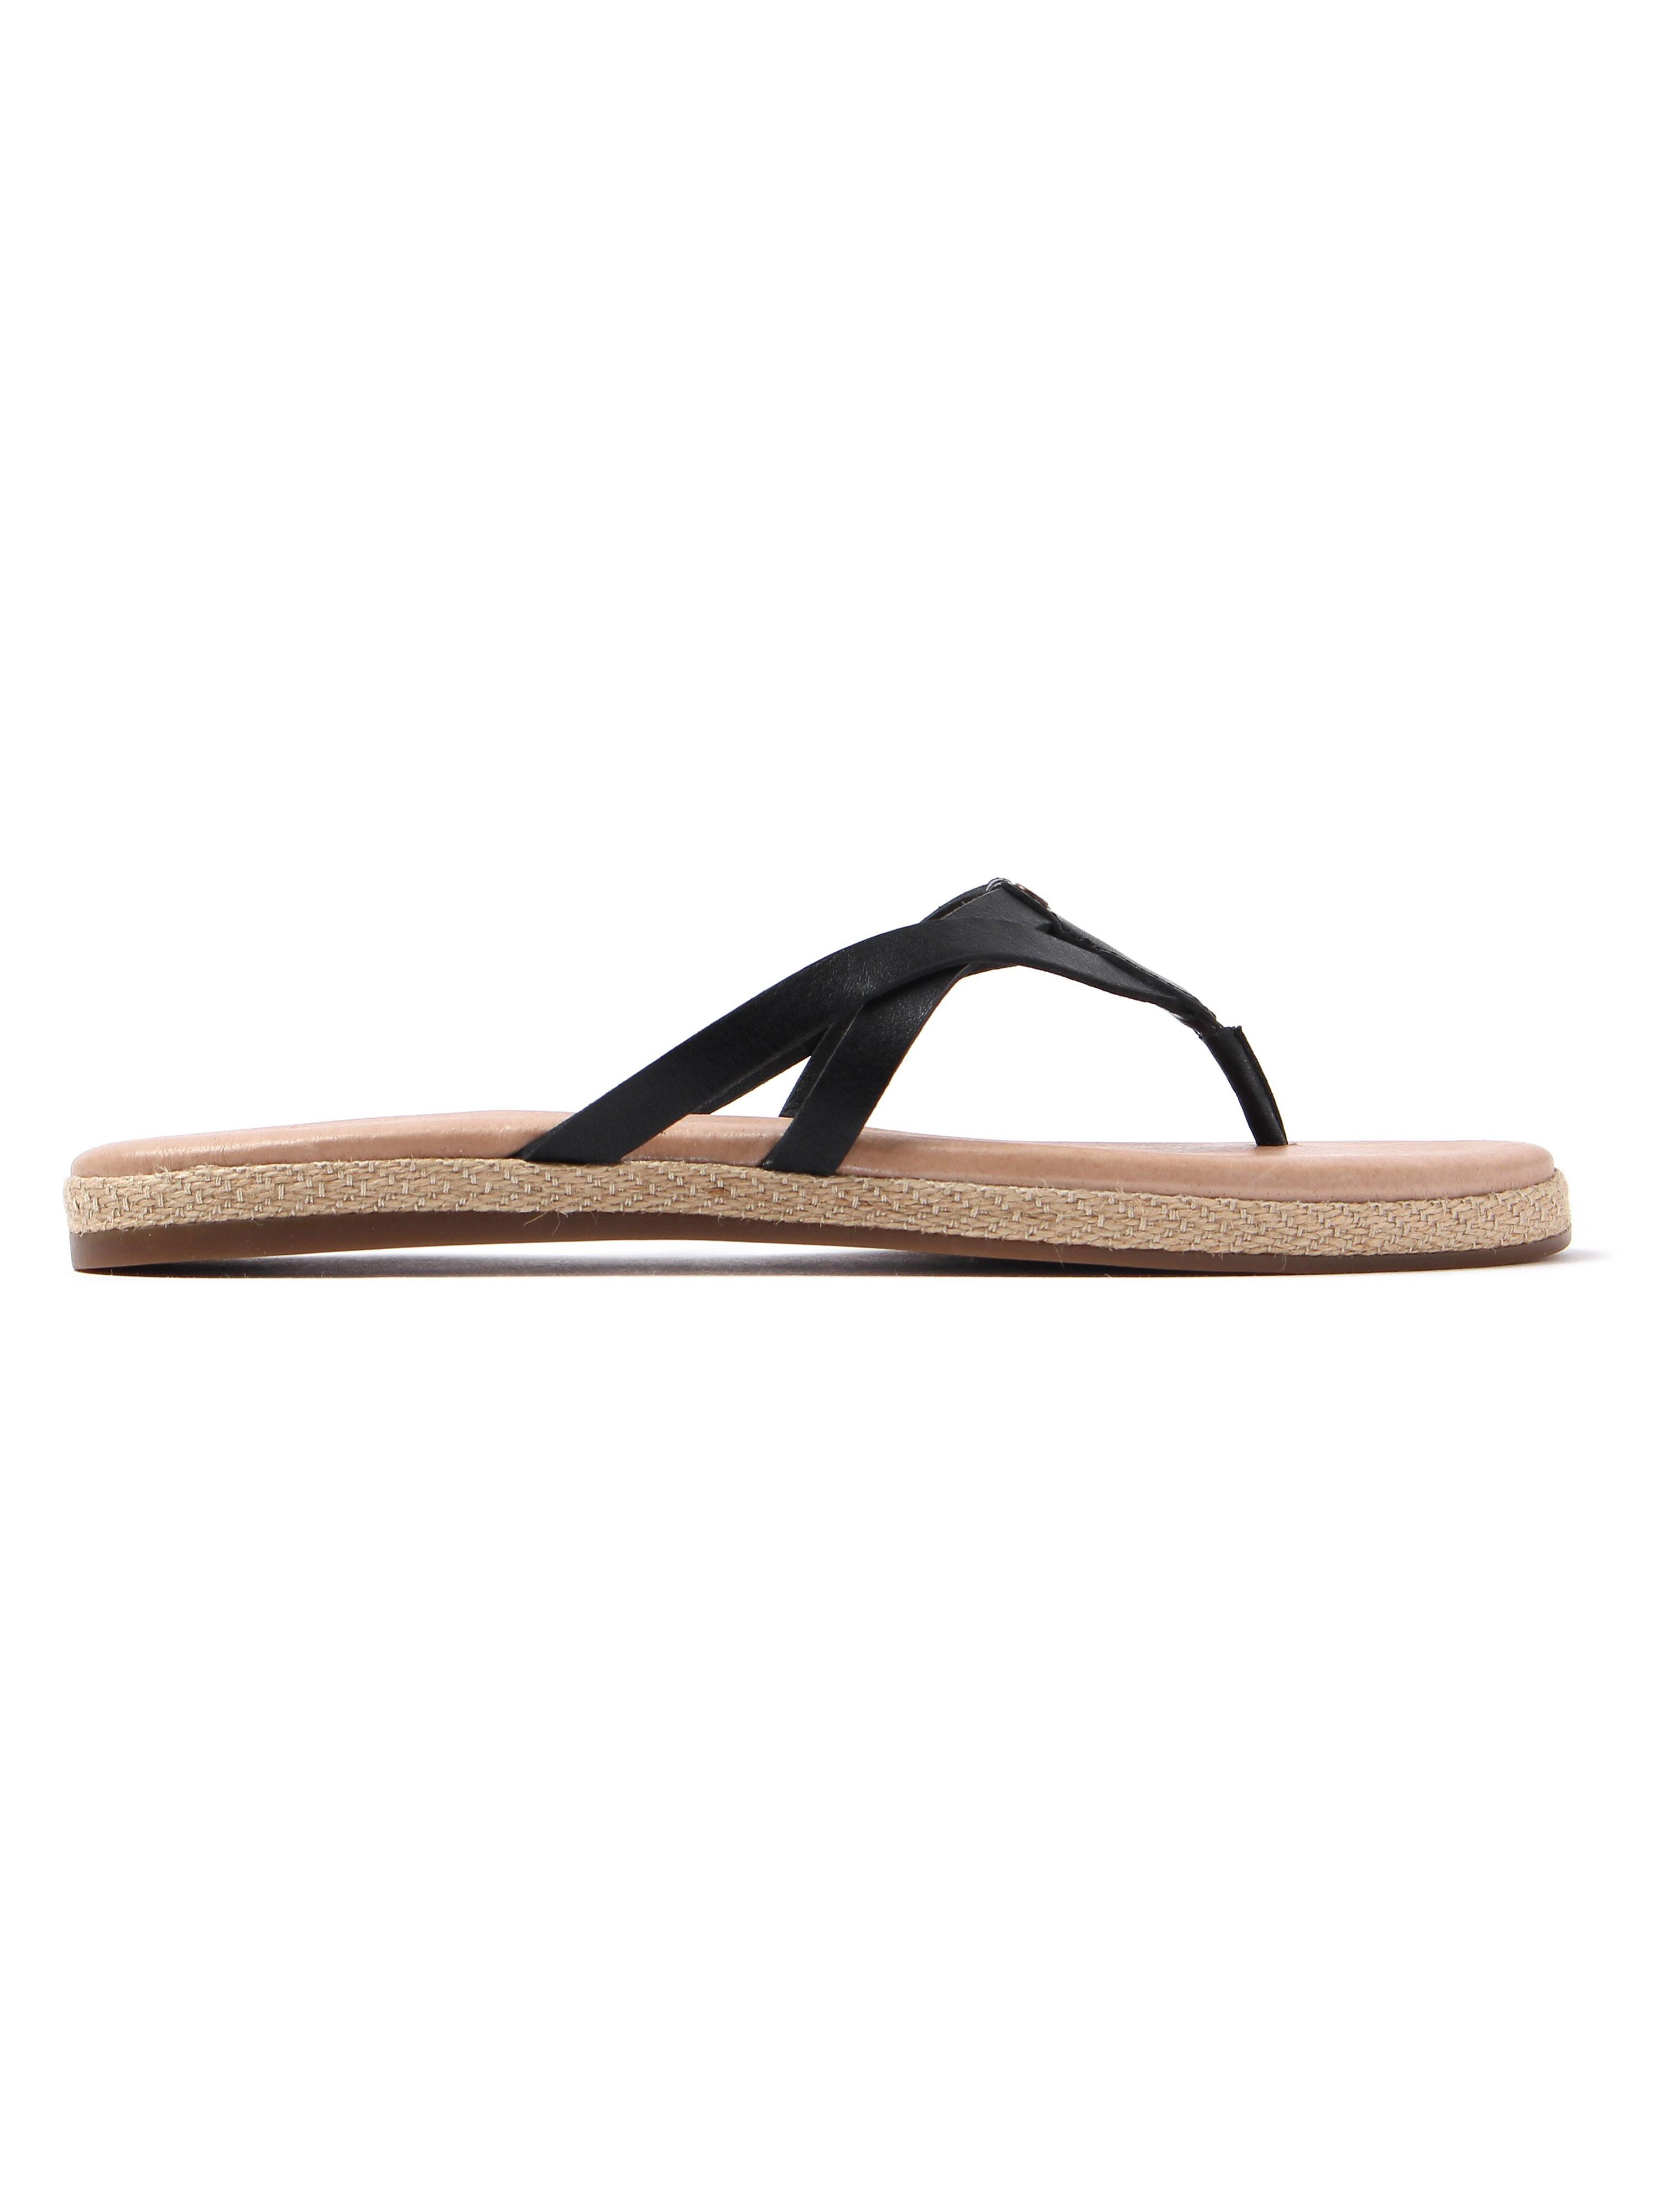 Ugg Women's Annice Leather Flip Flops - Black